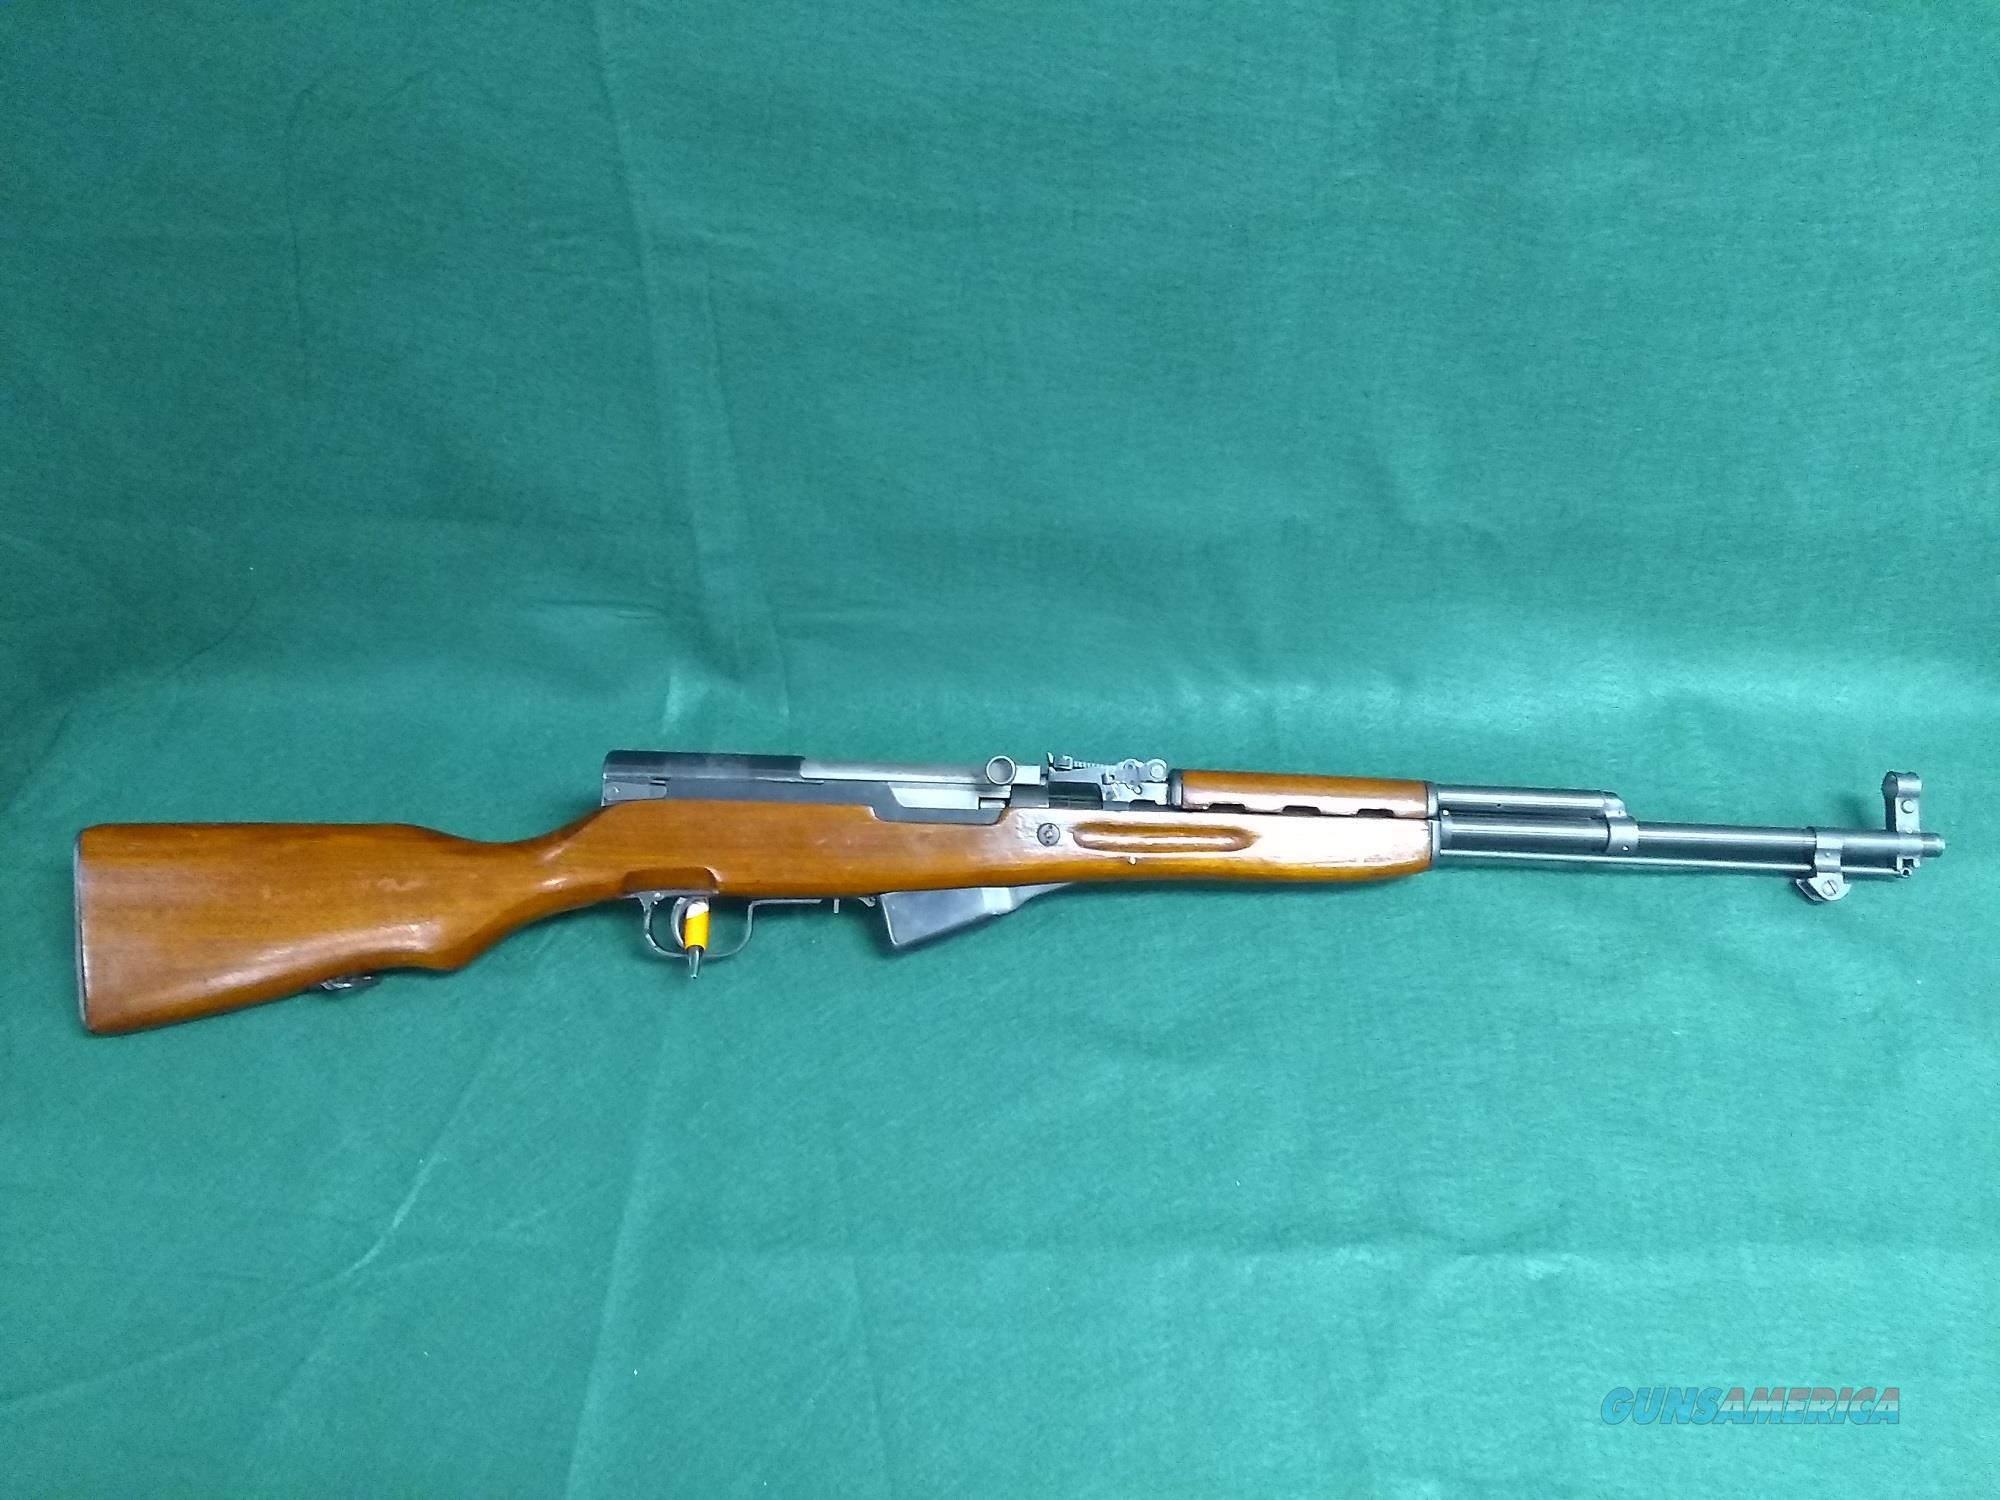 1976 Norinco SKS - 7.62X39mm  Guns > Rifles > Norinco Rifles